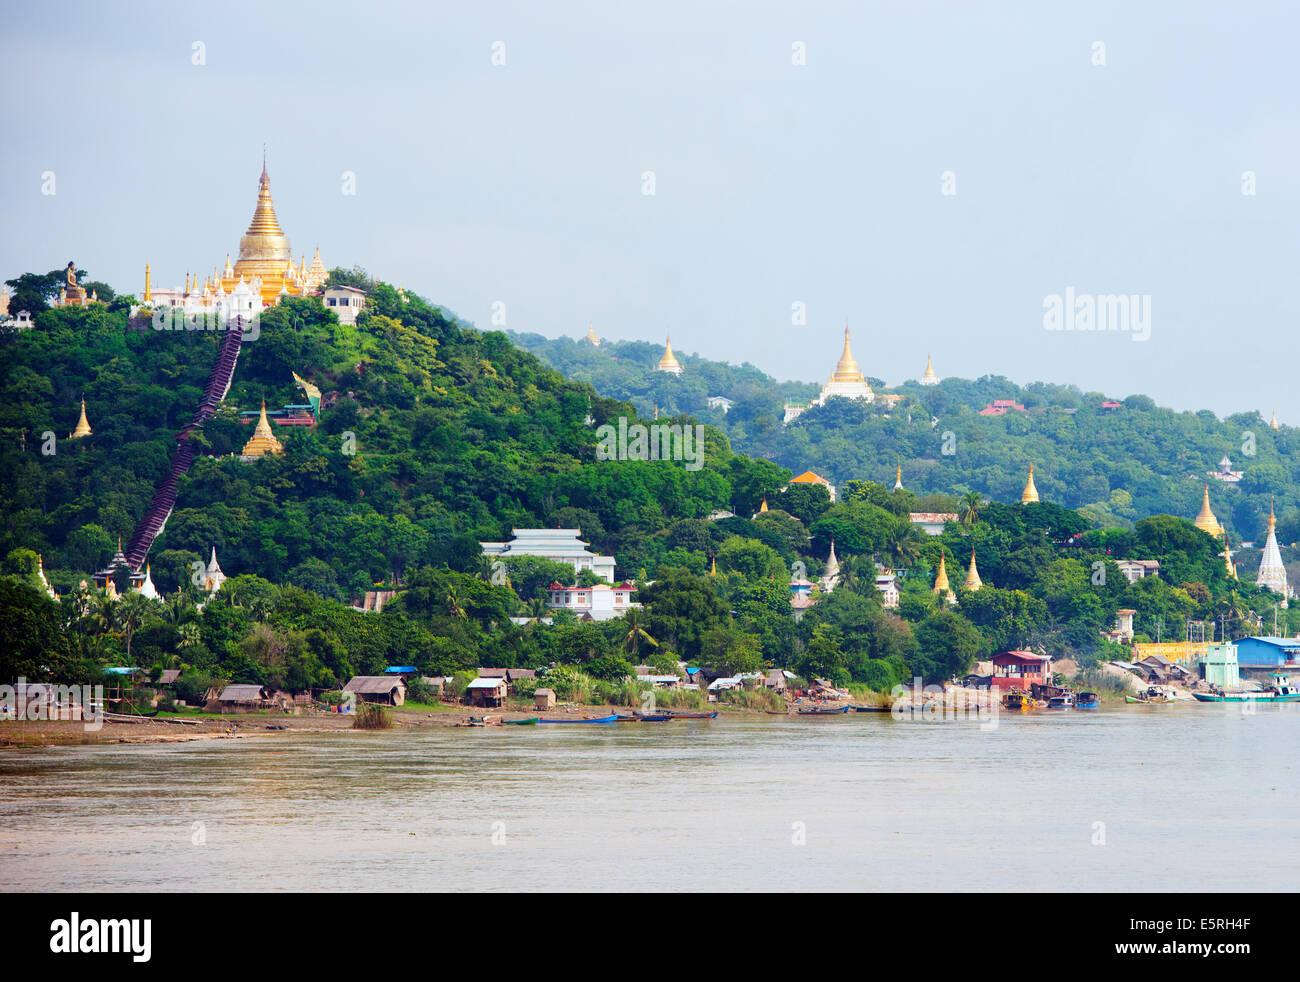 Southeast Asia, Myanmar (Burma), Mandalay, Sagaing Hill, Irrawaddy River - Stock Image